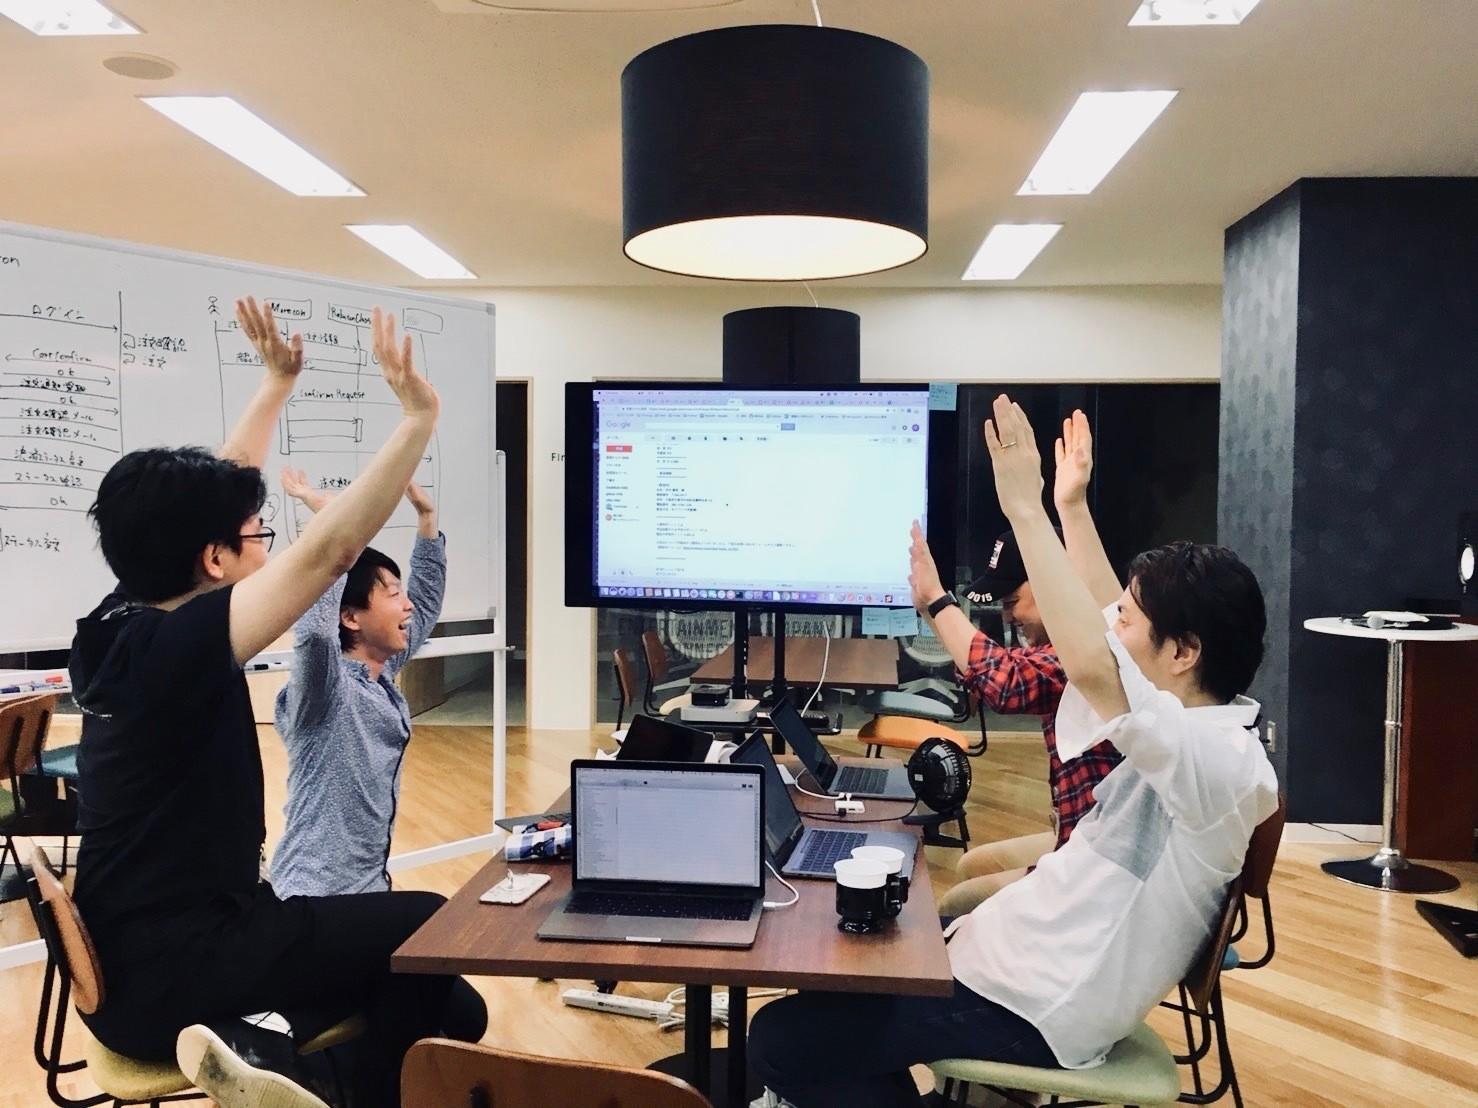 [iOSエンジニア] グローバルな開発チームでドラッグストアの業務課題を解決するiOSエンジニアを募集